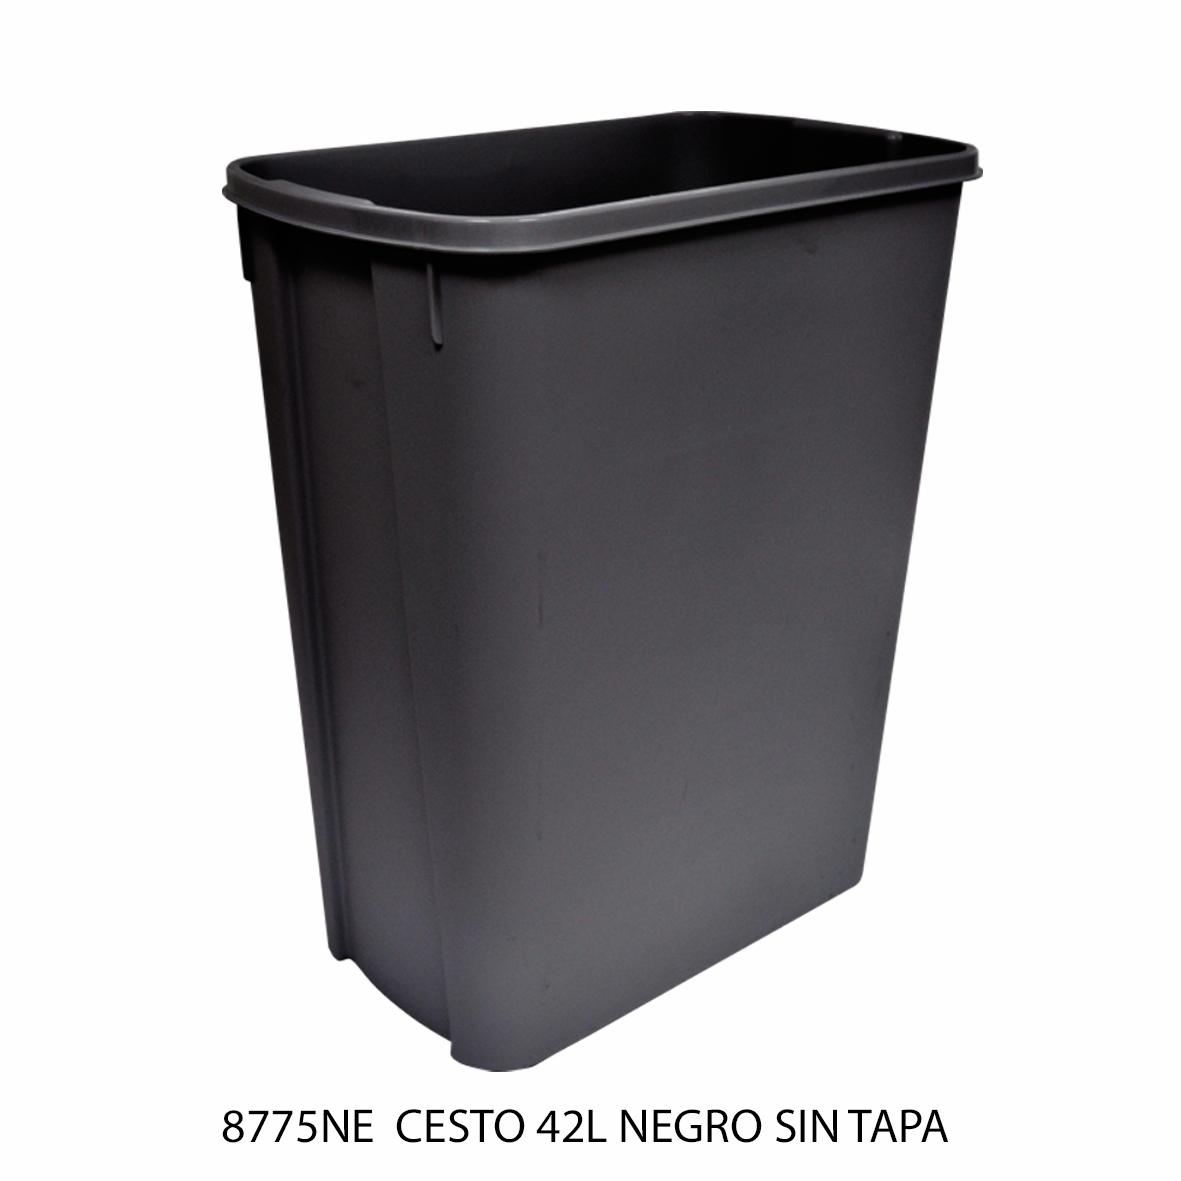 Bote de basura mediano de 42 litros sin tapa color negro modelo 8775NE de Sablón